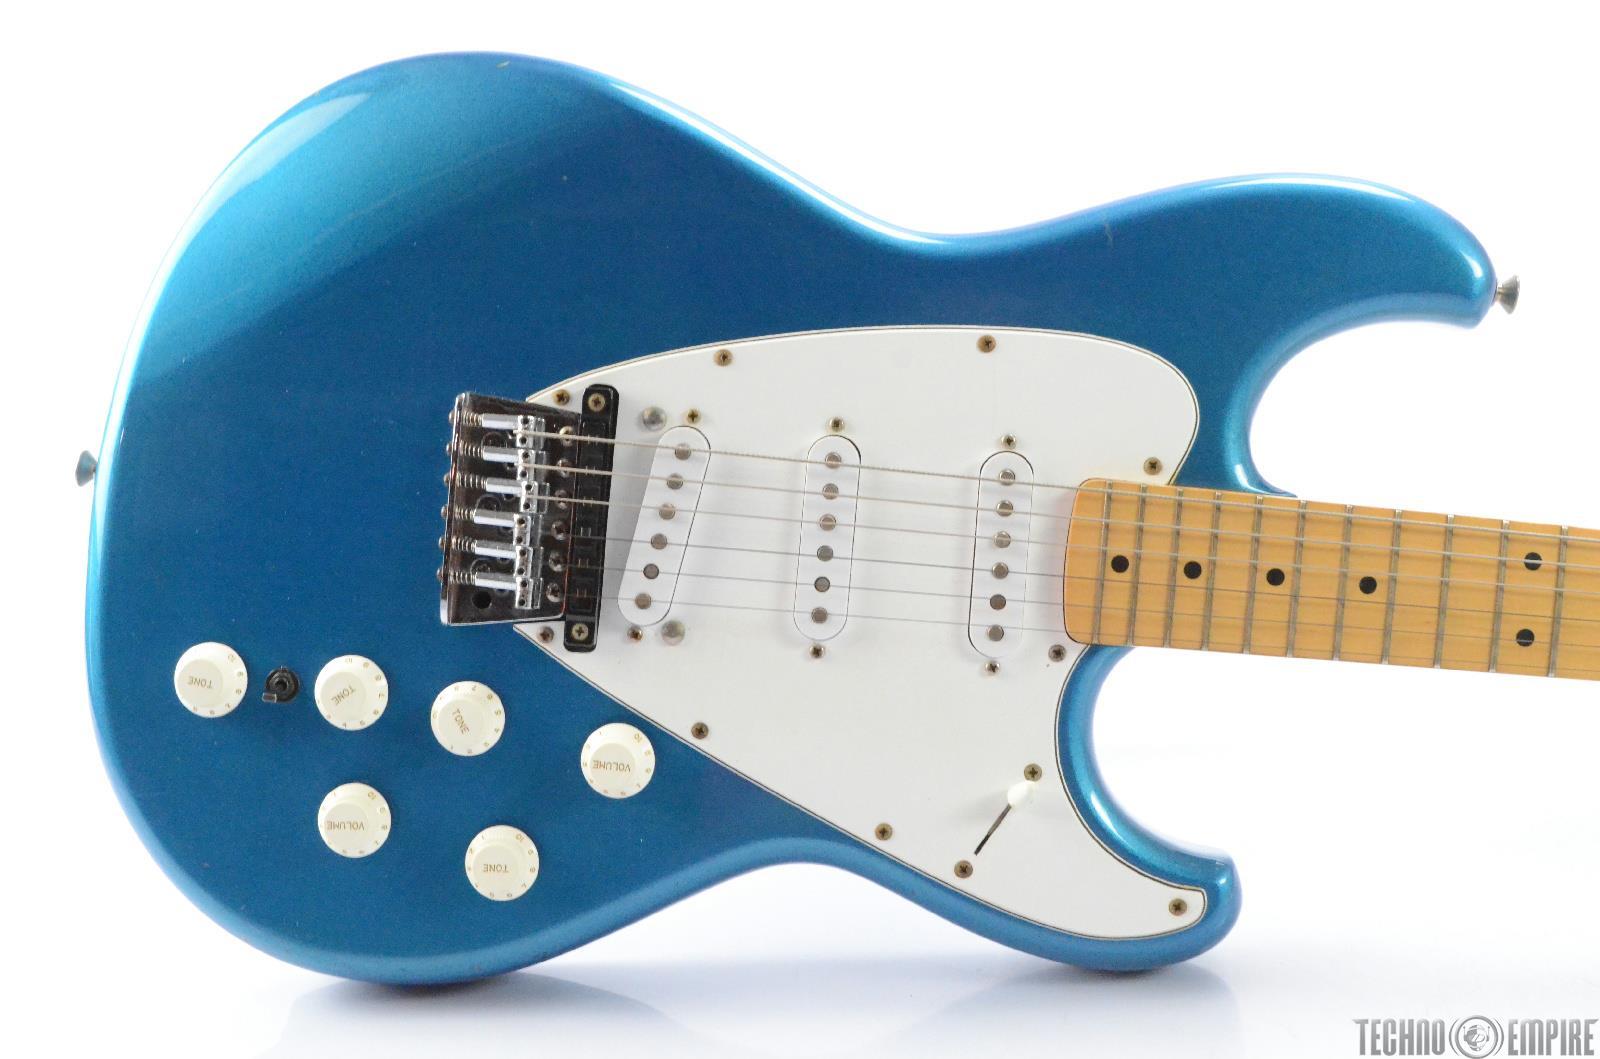 Roland G-505 Synth Guitar w/ GM-70 MIDI Converter & SC-55 Sound Canvas #28251